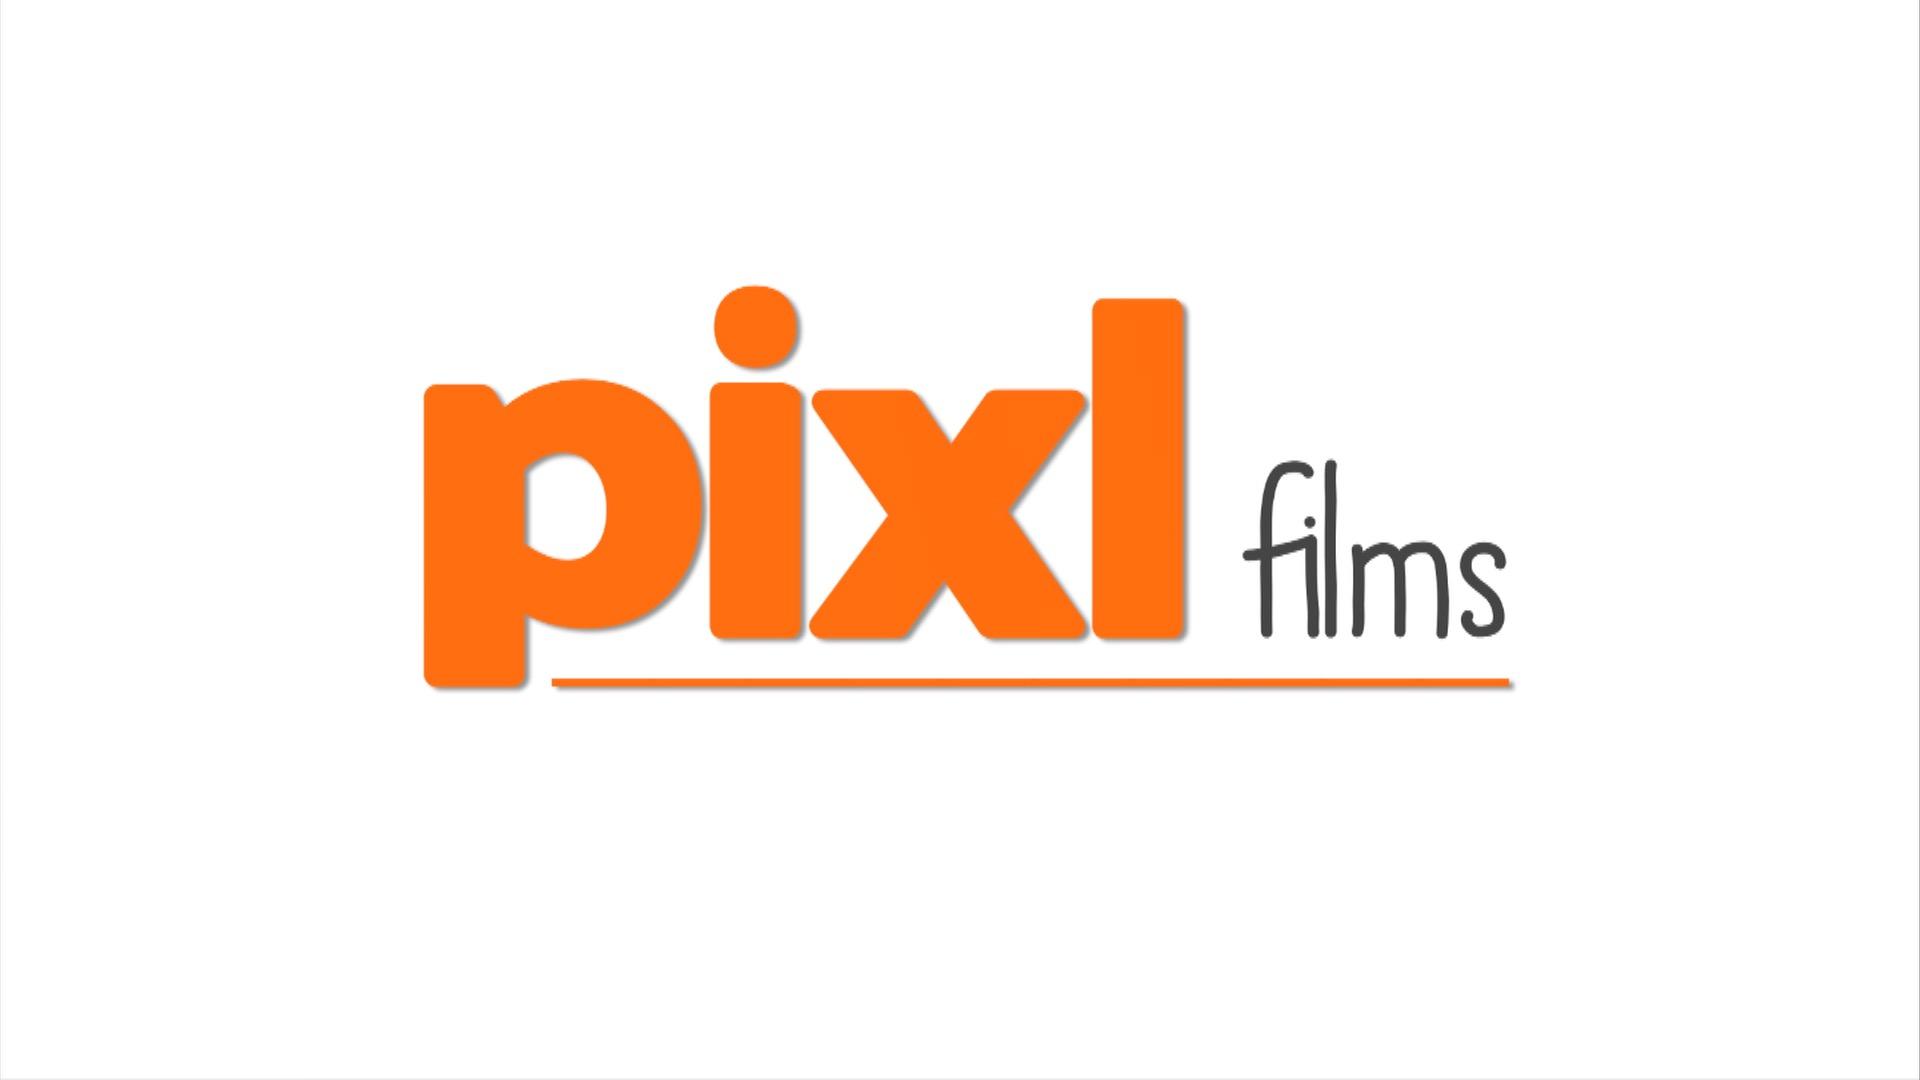 demo-pixl-films